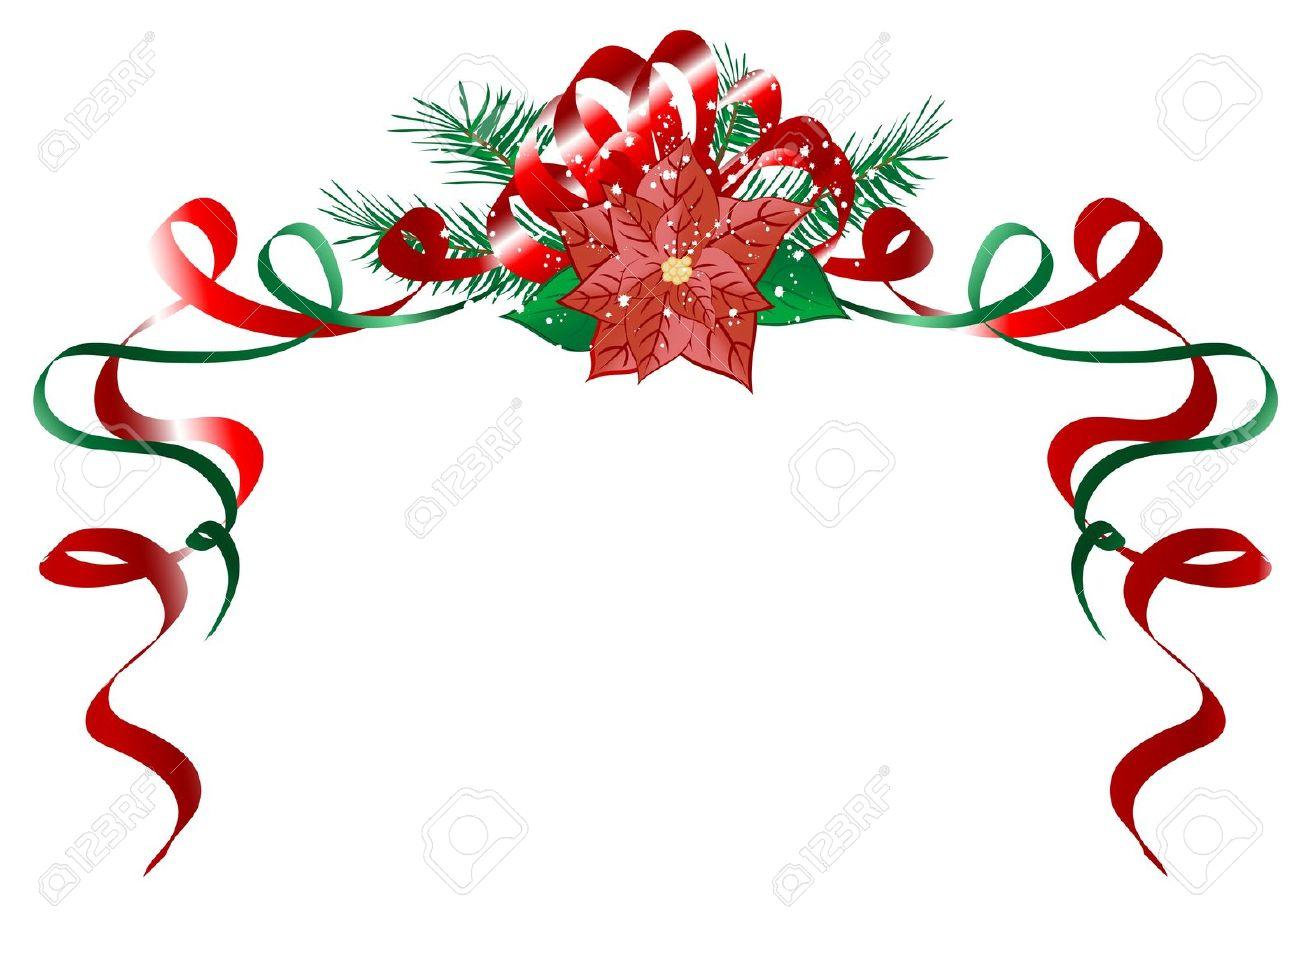 1300x978 Poinsettia Border Clip Art For Free 101 Clip Art